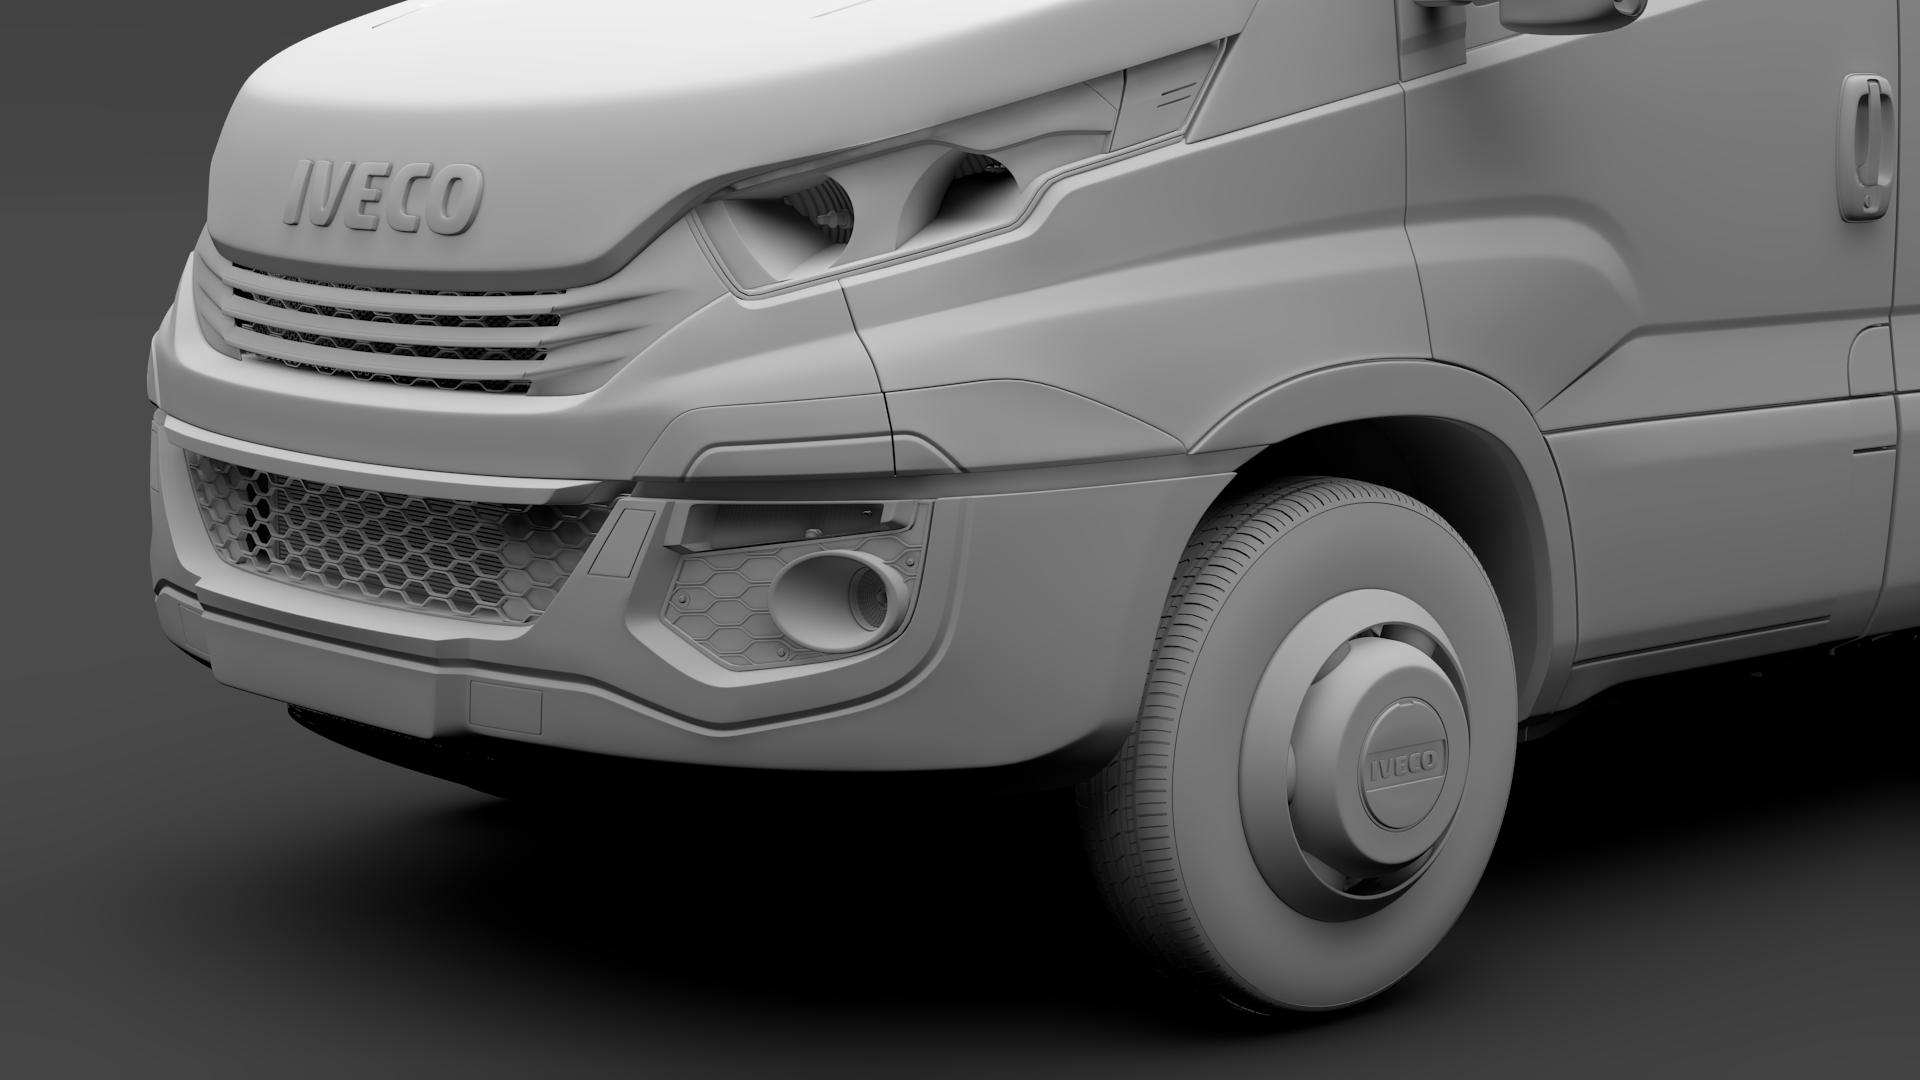 iveco daily minibus l2h2 2017 3d model max fbx c4d lwo ma mb hrc xsi obj 276019